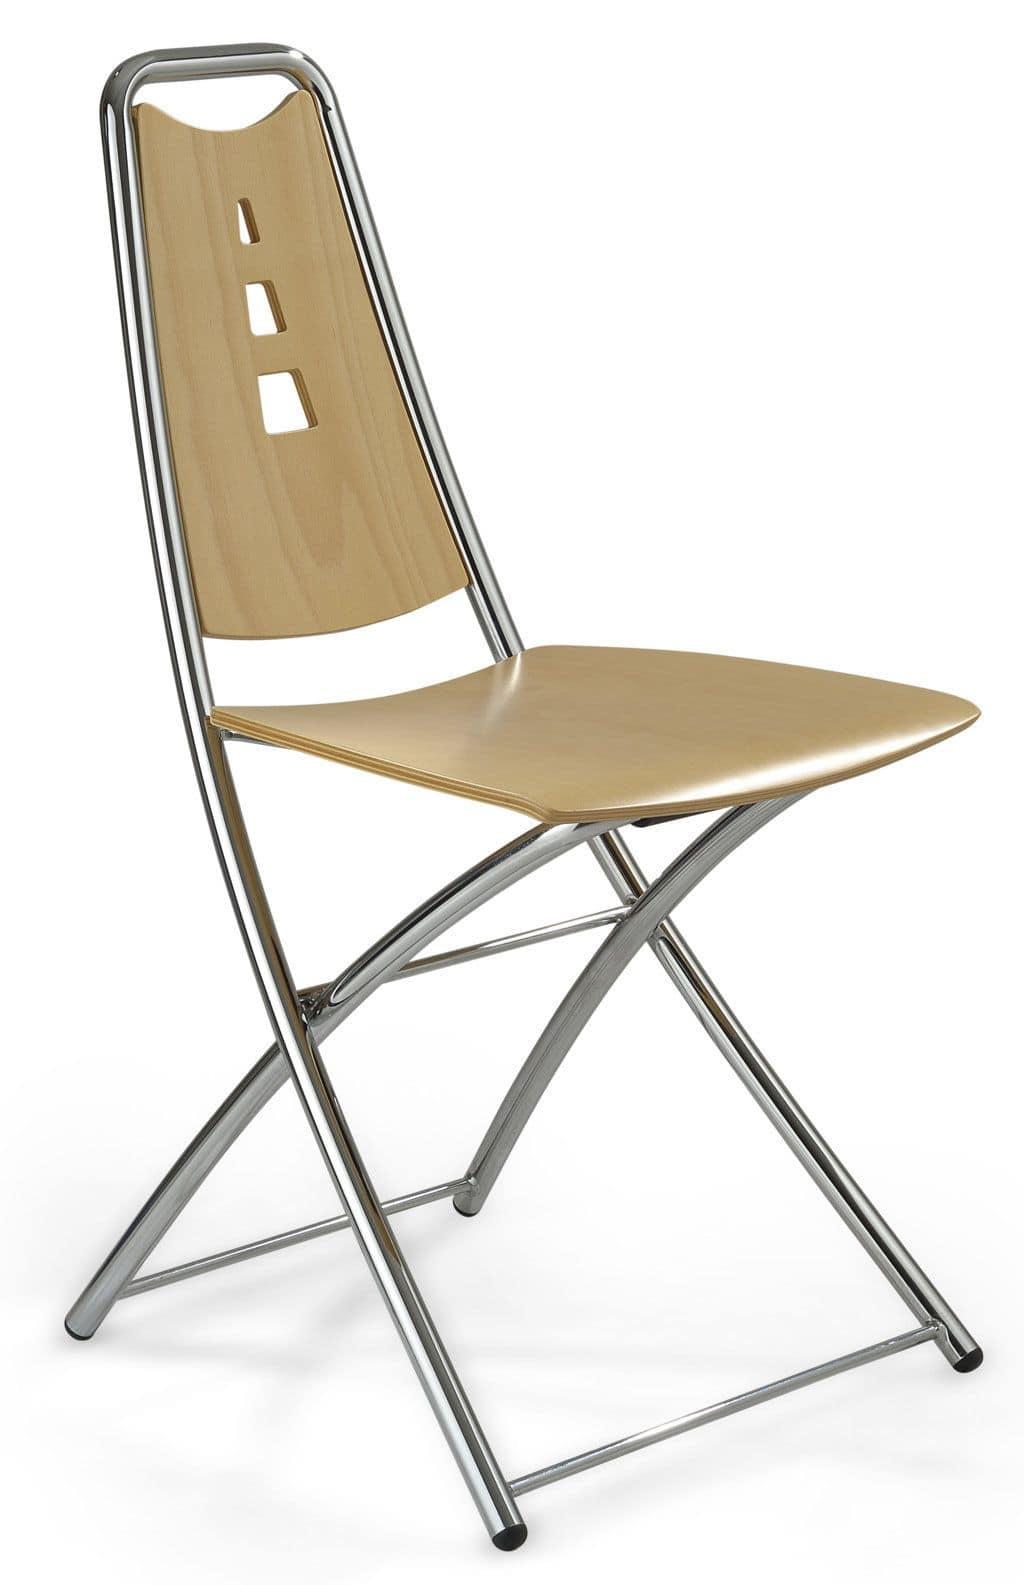 Stilo Stackable chair fices IDFdesign